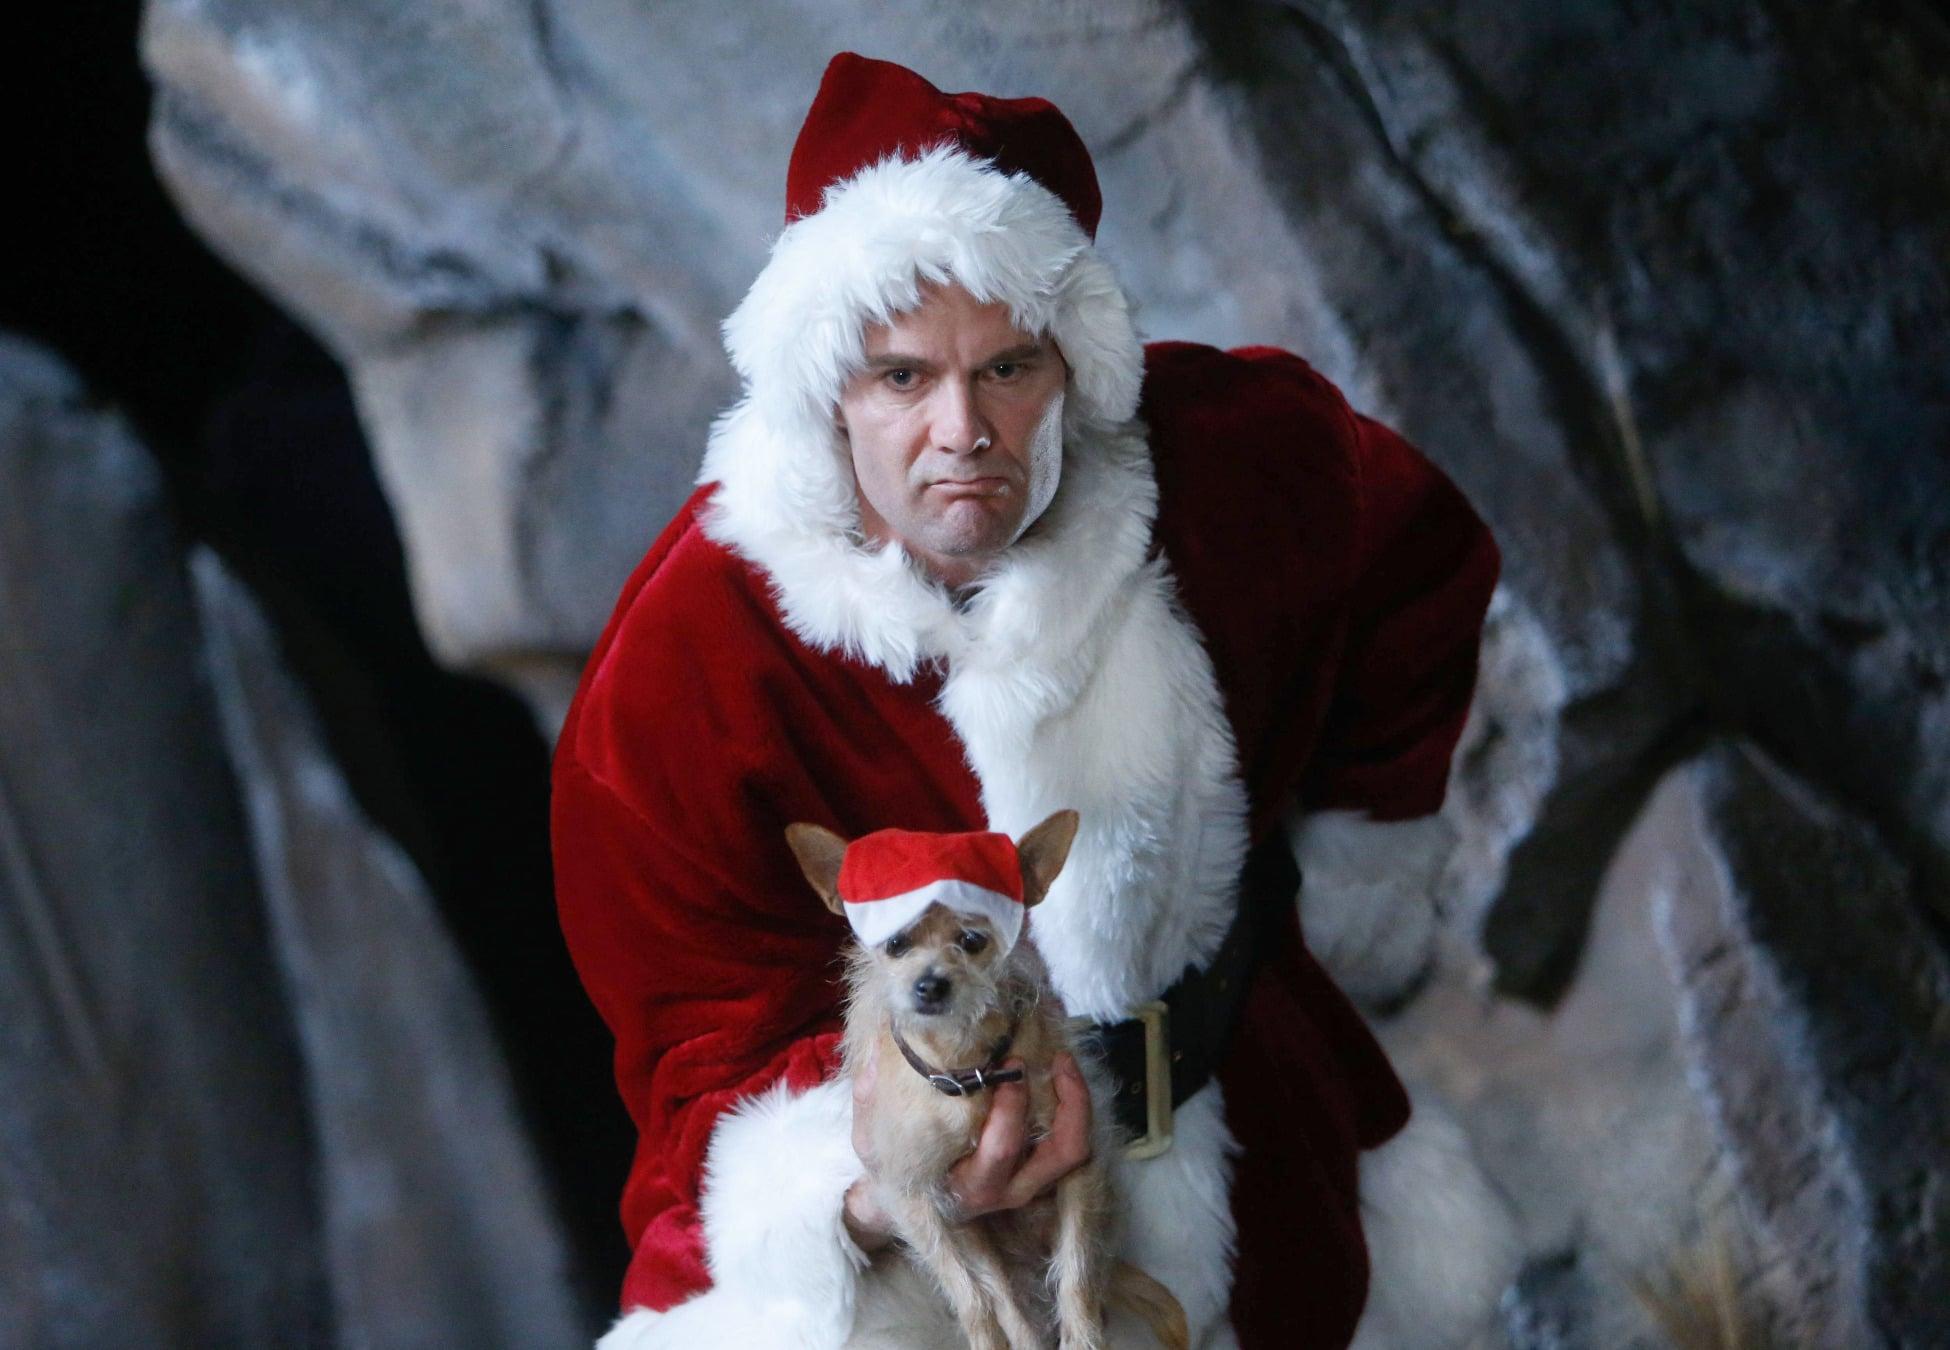 The Grinch Who Stole Christmas Mayor.Raising Hope The Pressure Of Being Mayor Turns Burt Garret